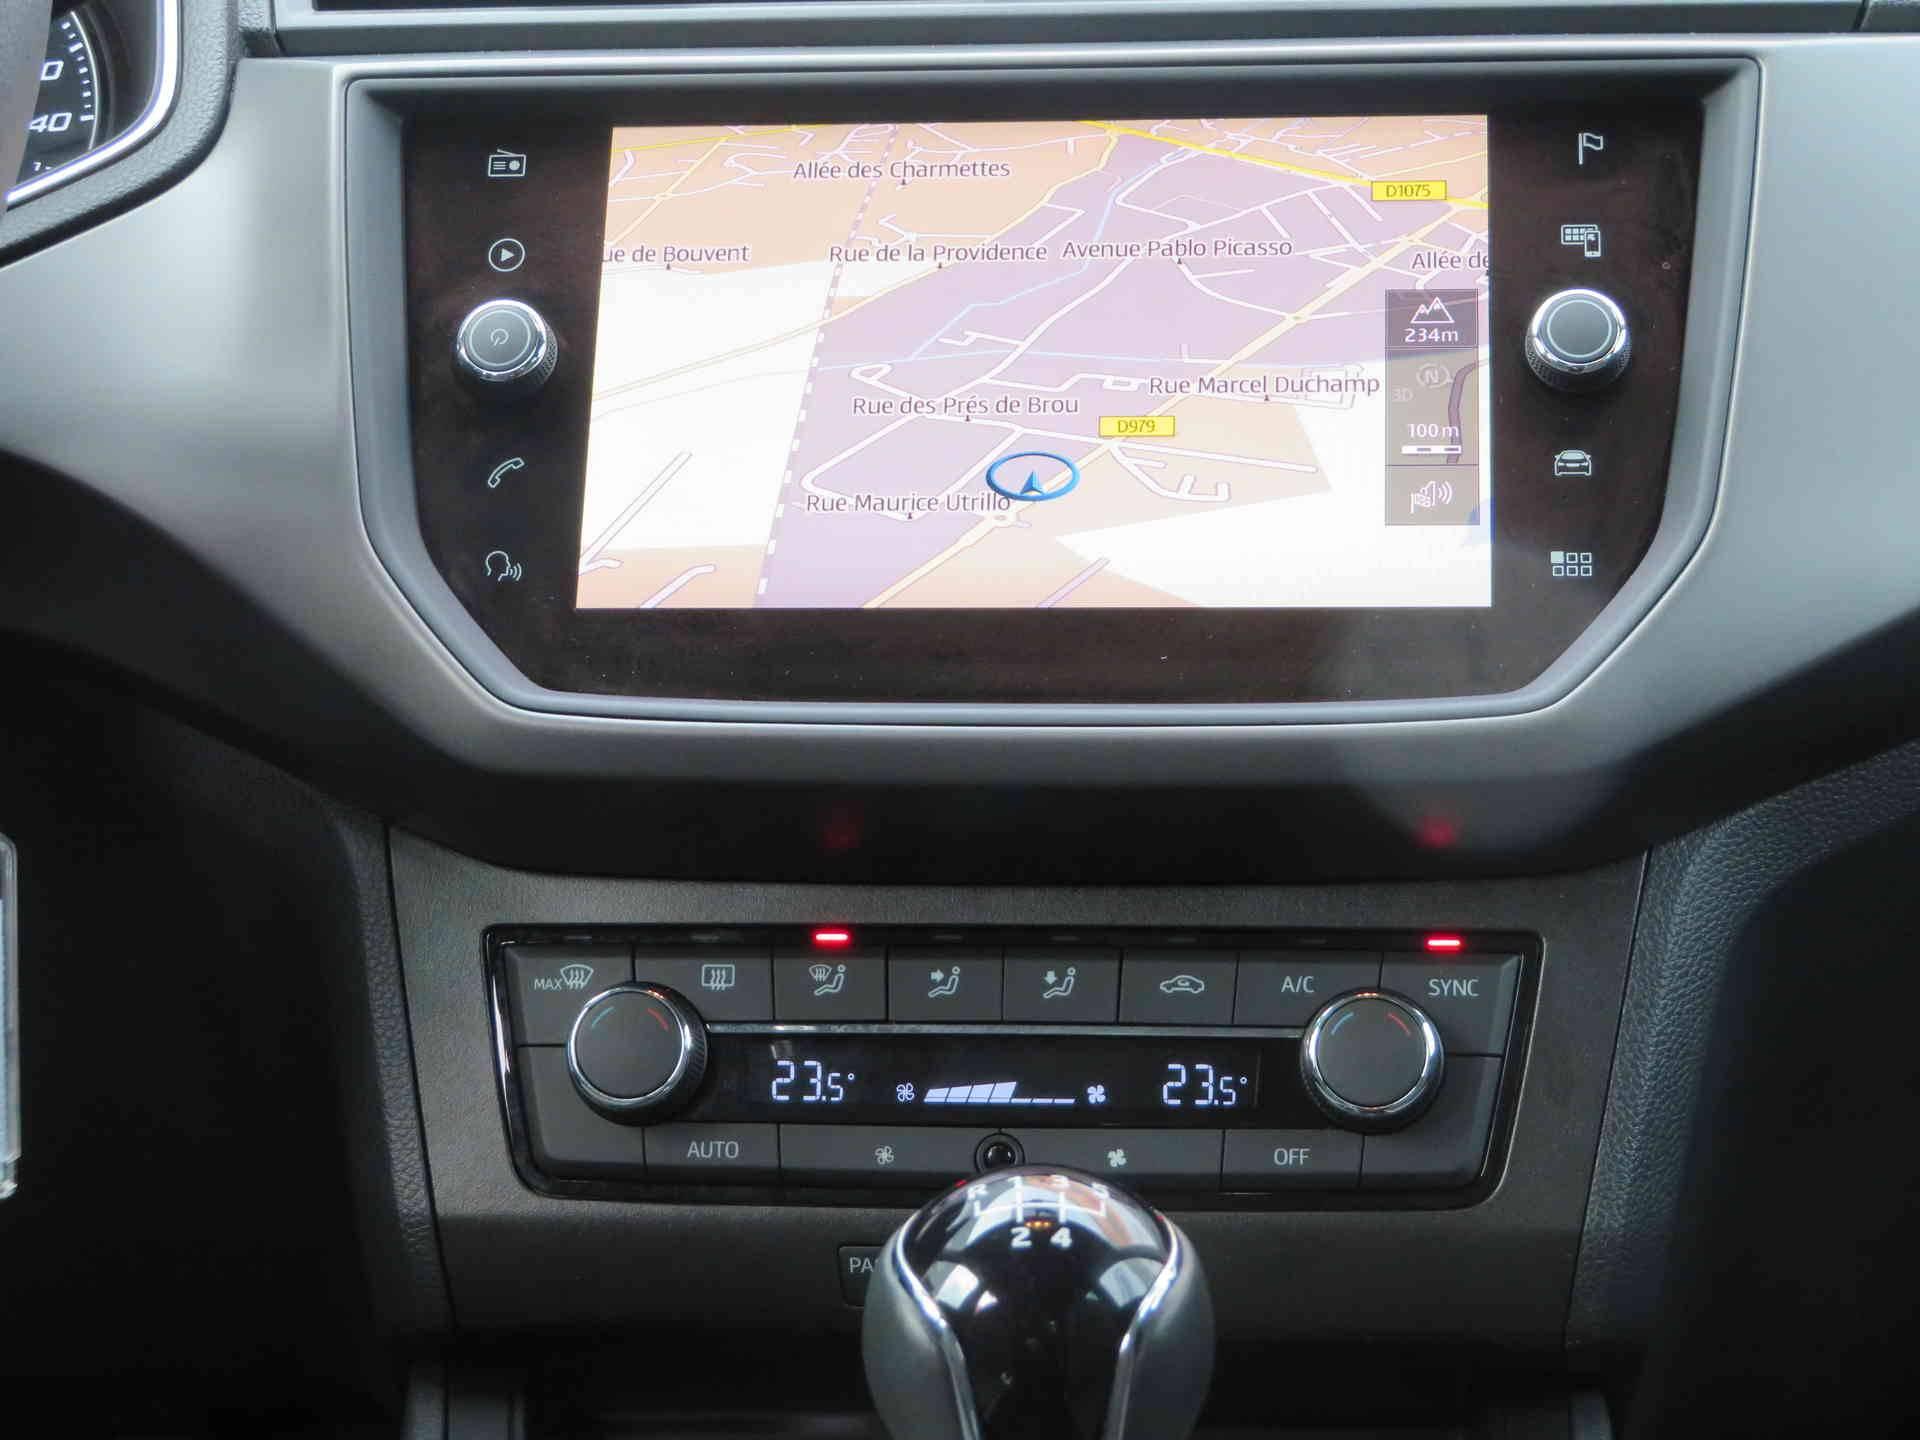 9 - Ibiza 1.6 TDI 95 ch S/S BVM5